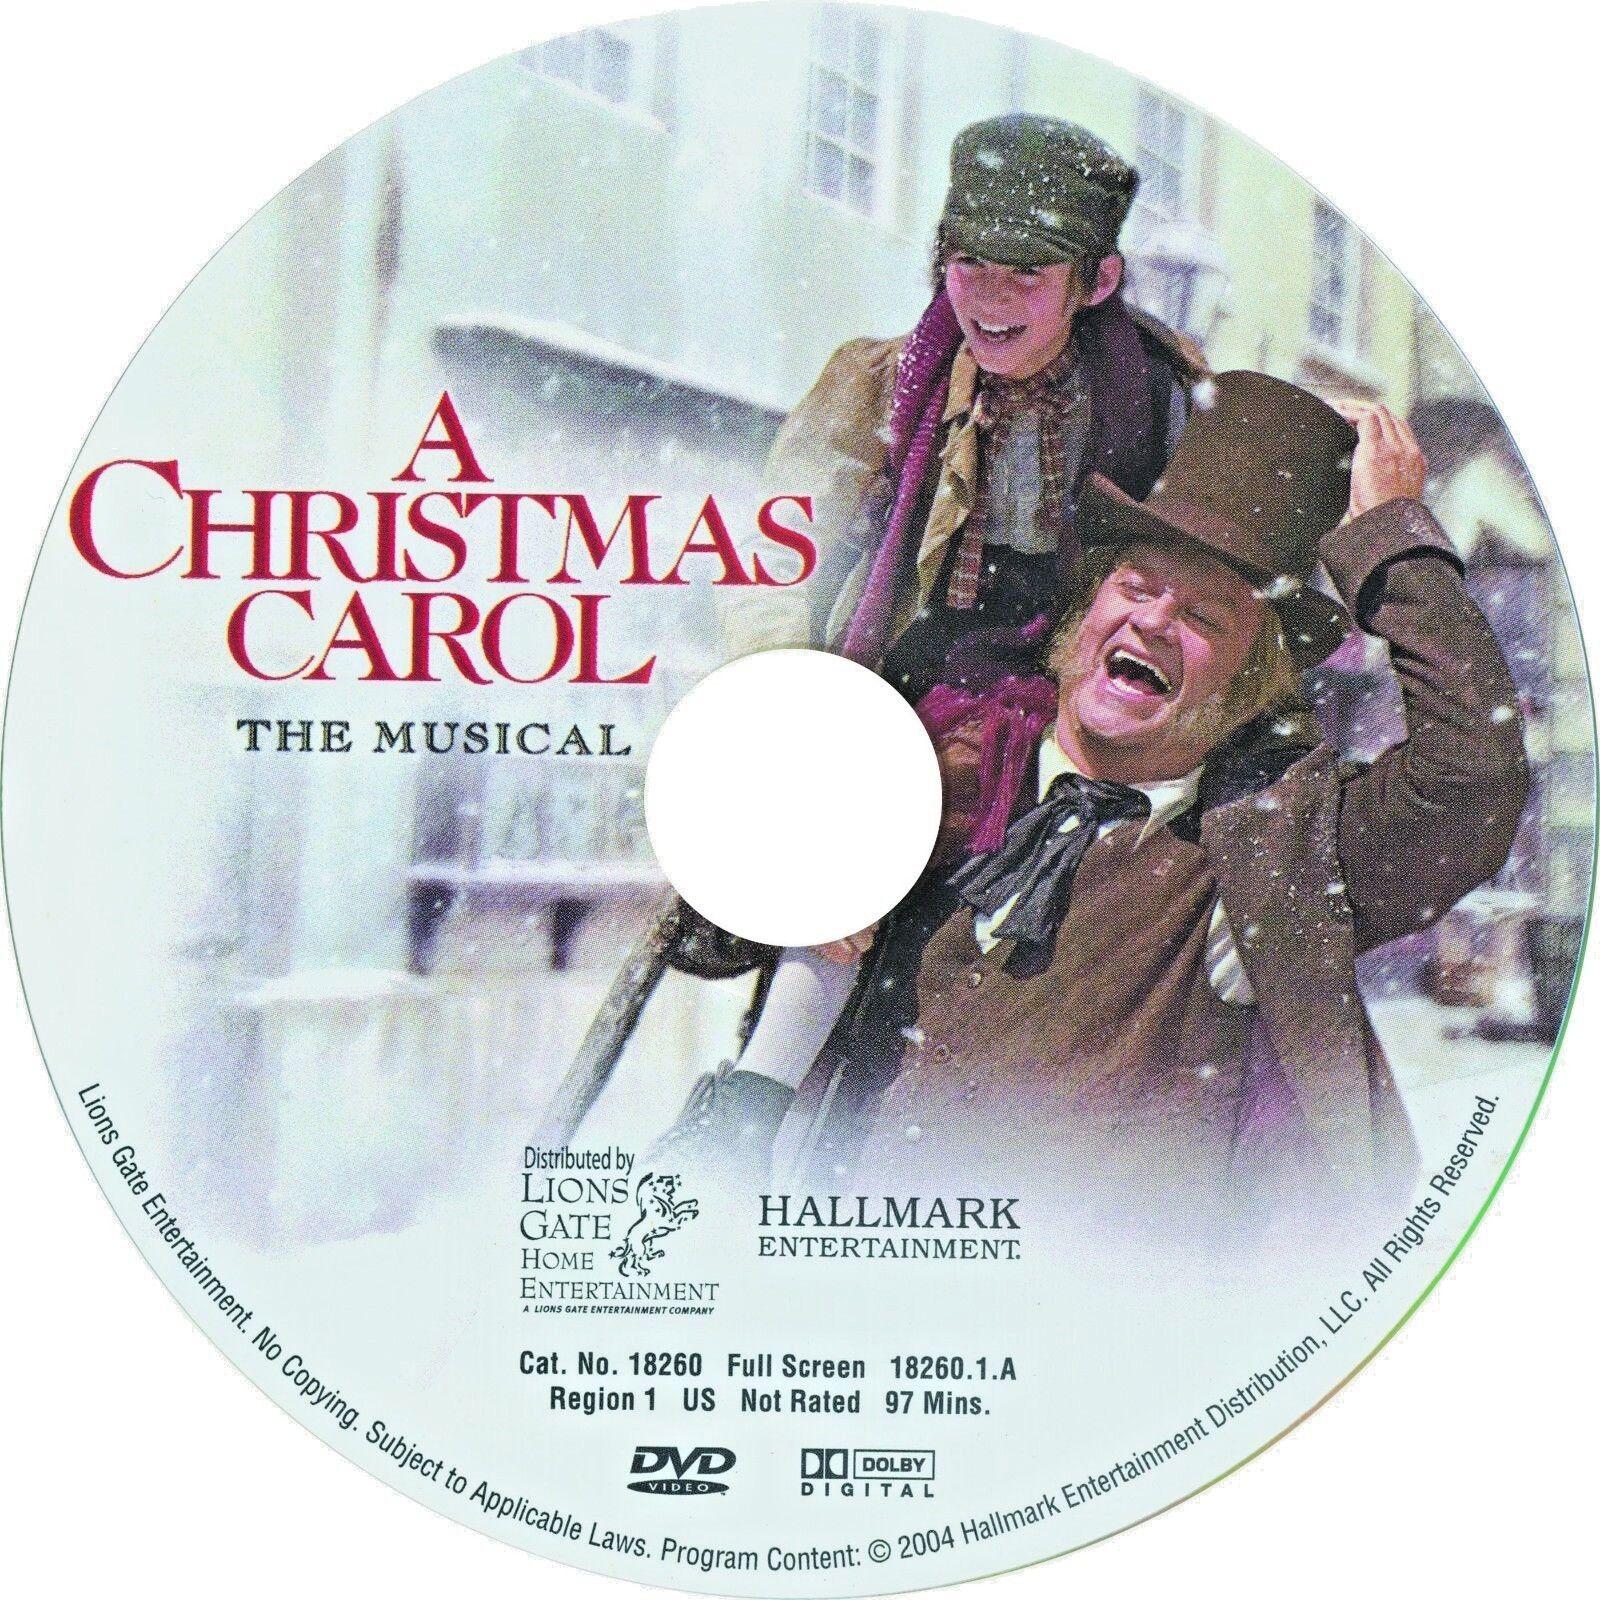 A Christmas Carol - The Musical (DVD, 2005) | eBay